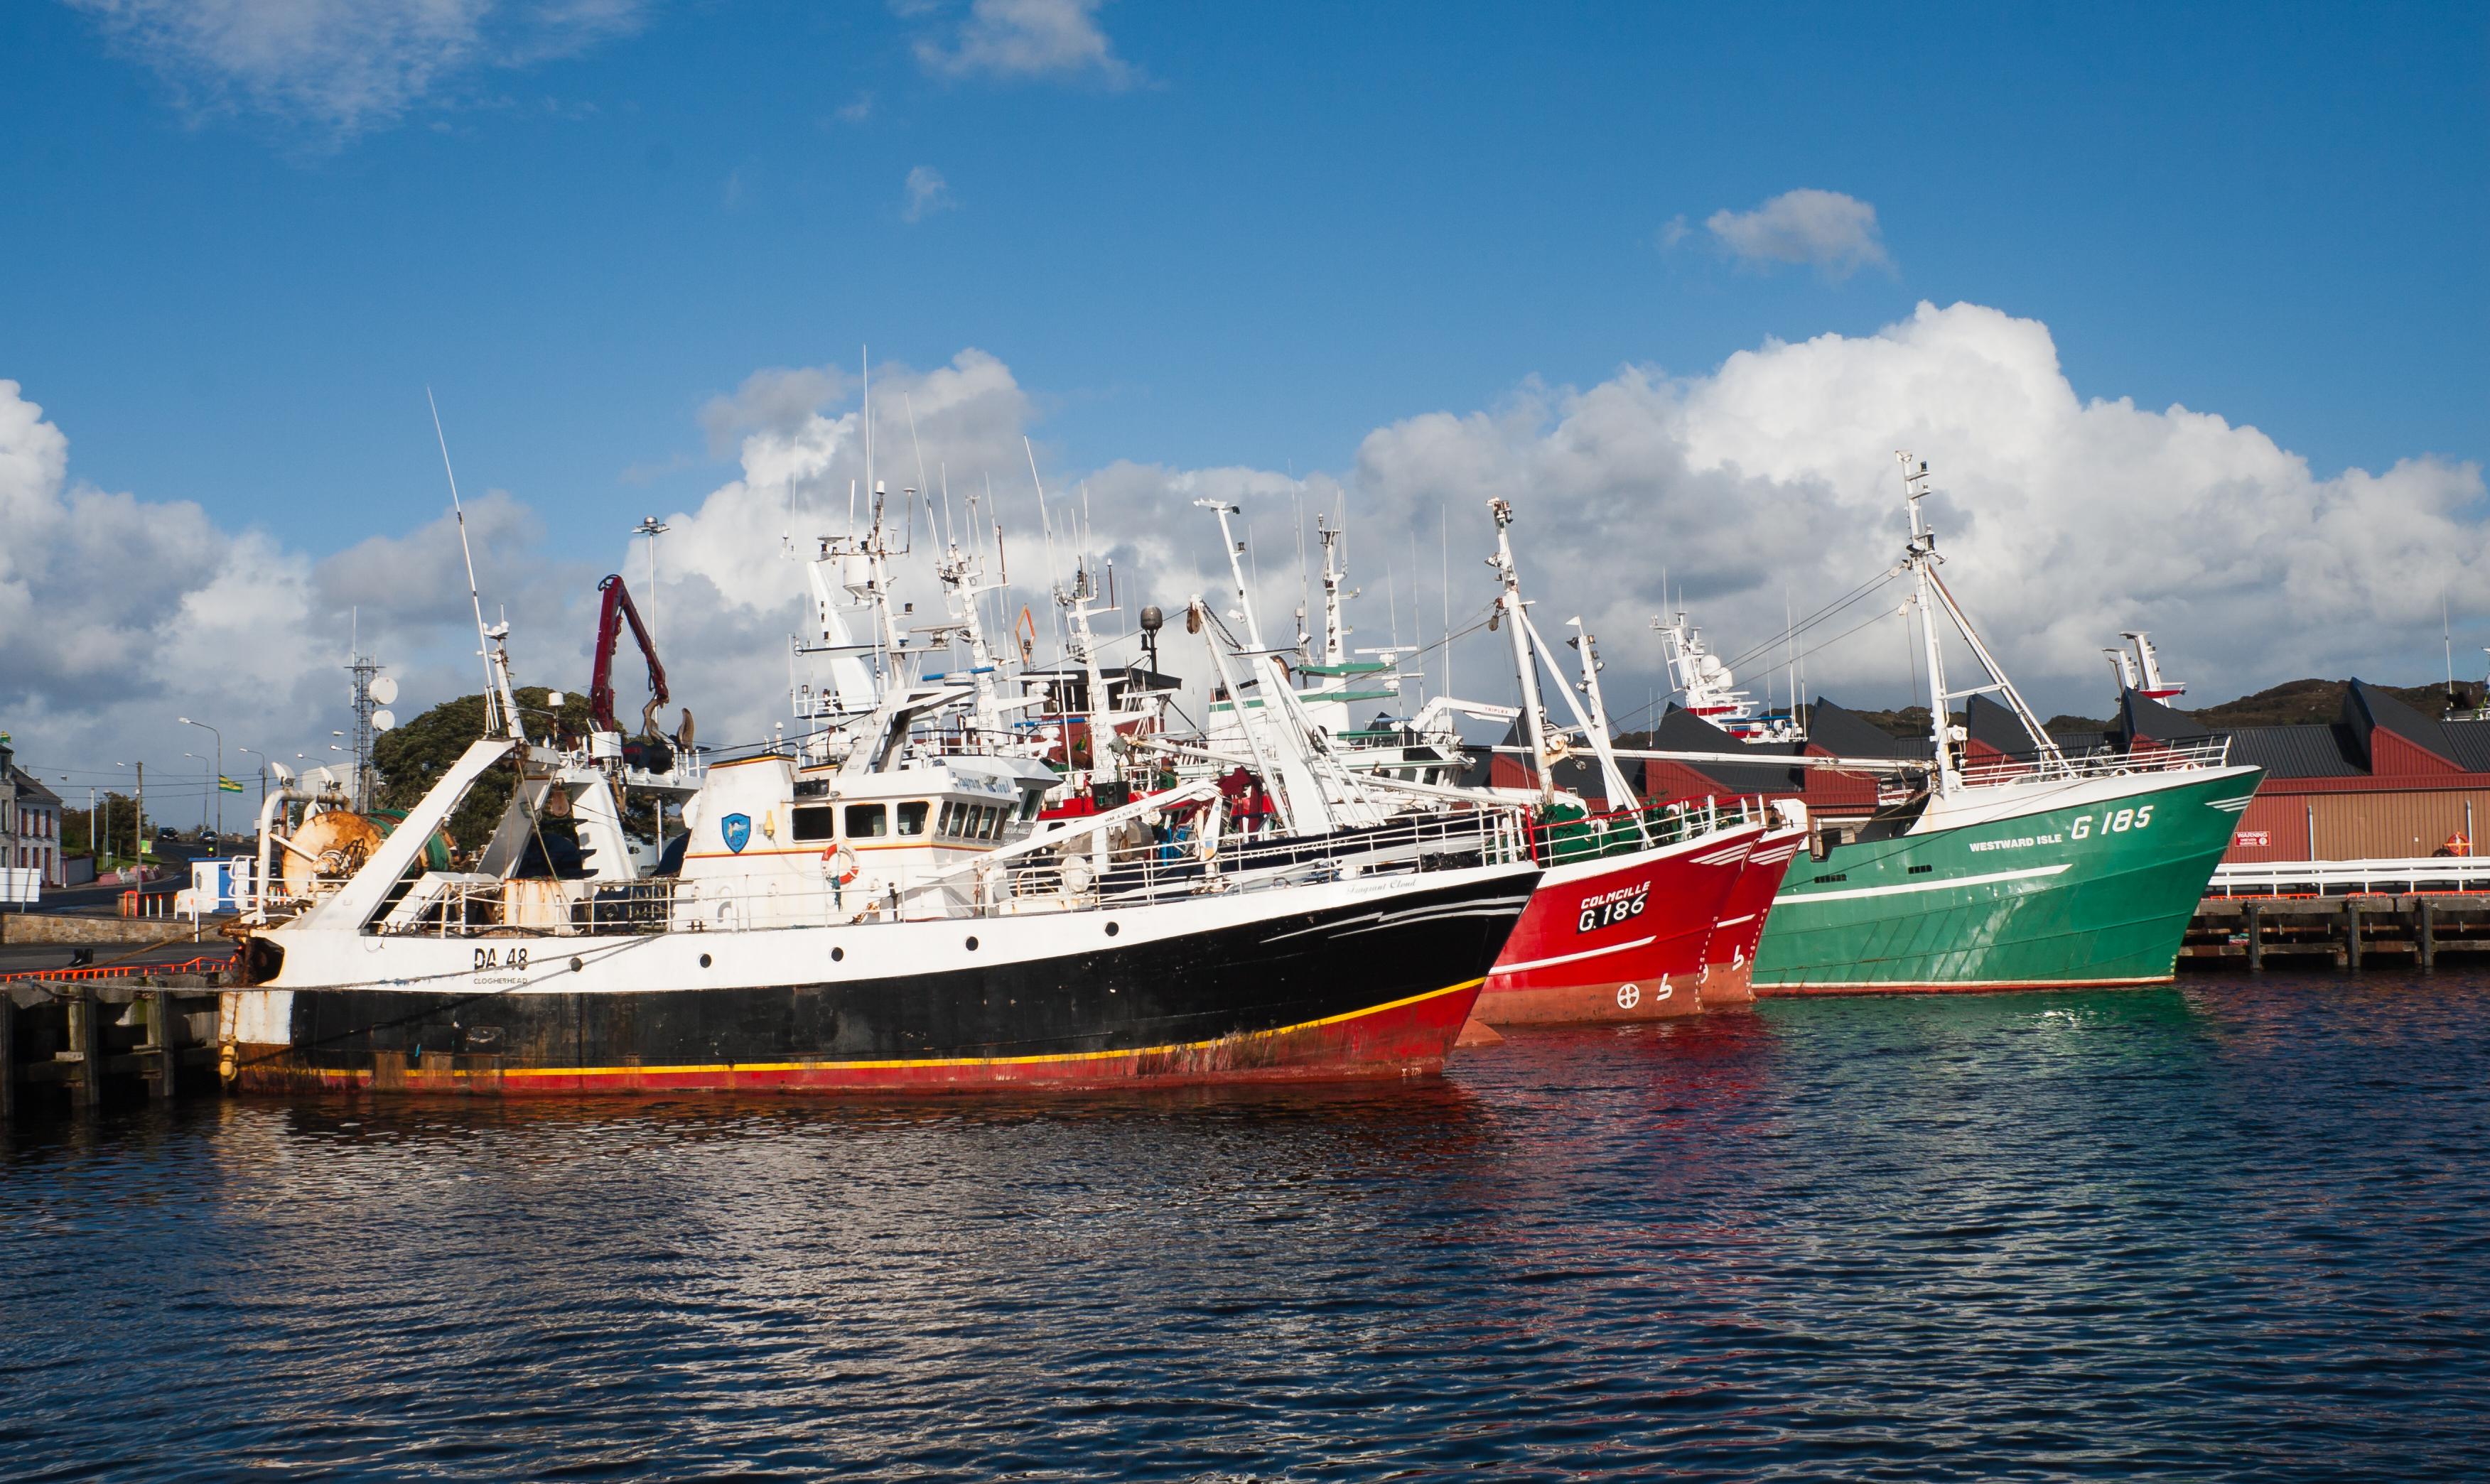 File:Killybegs Harbour Fishing Trawlers 2012 09 16.jpg - Wikimedia ... Donegal